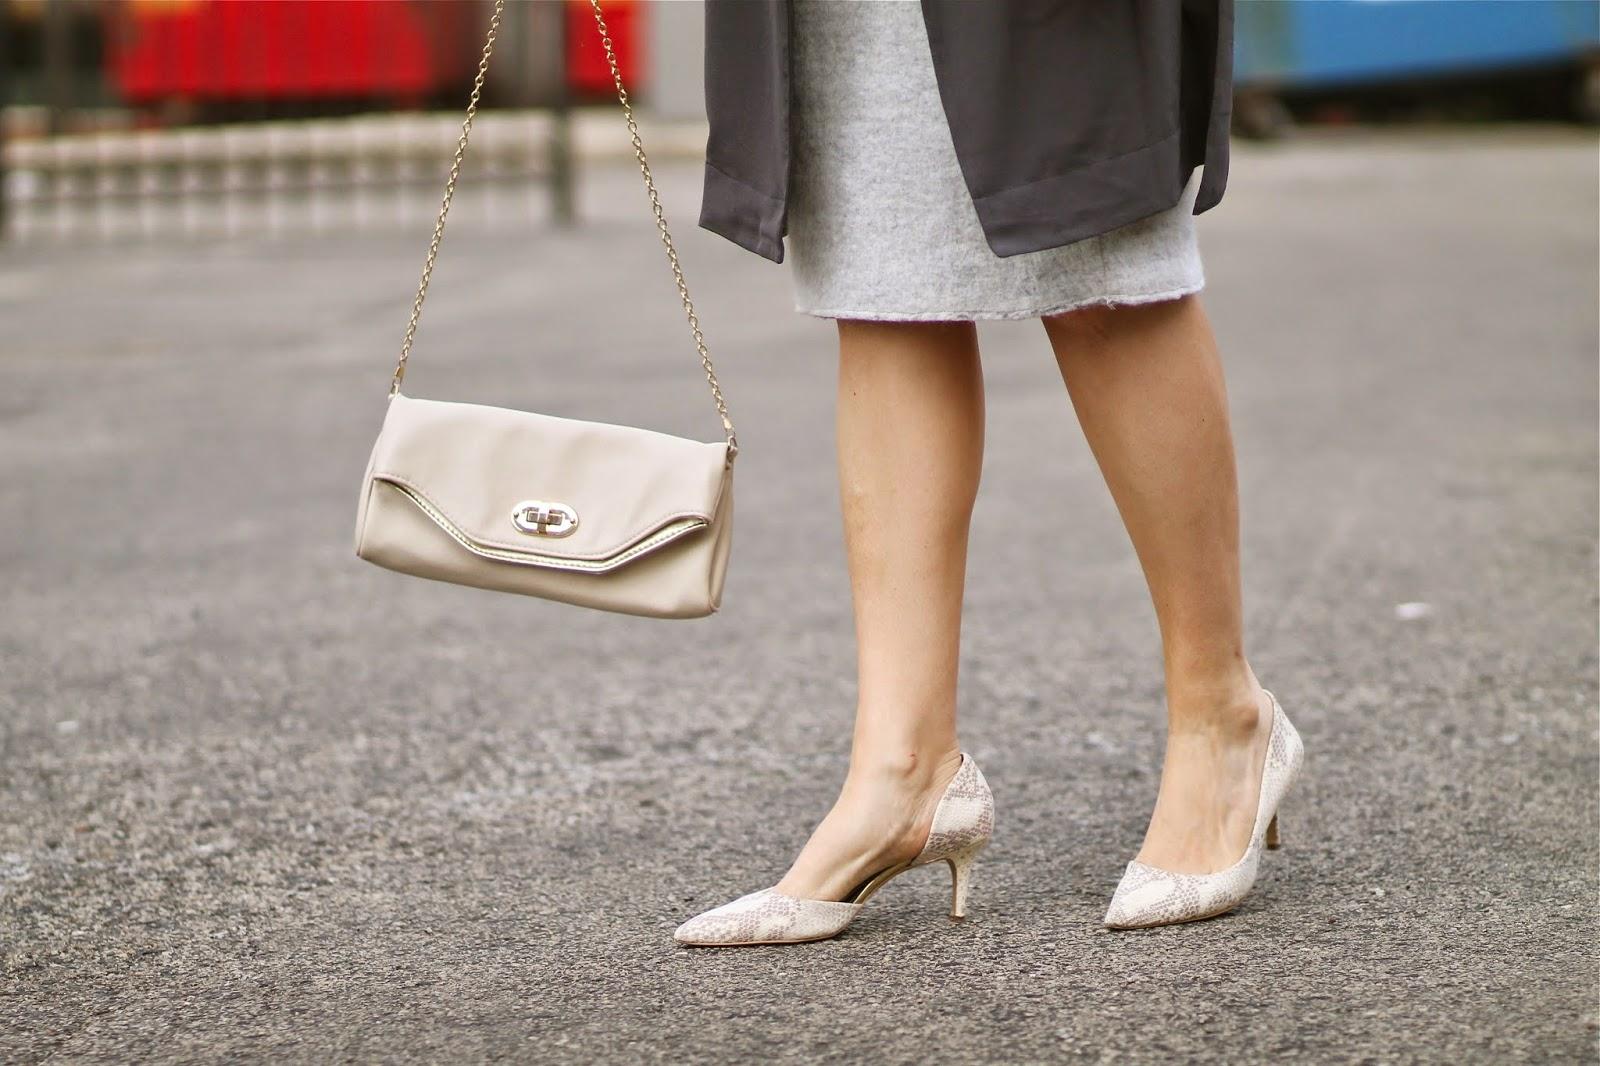 chain, purse, ivory